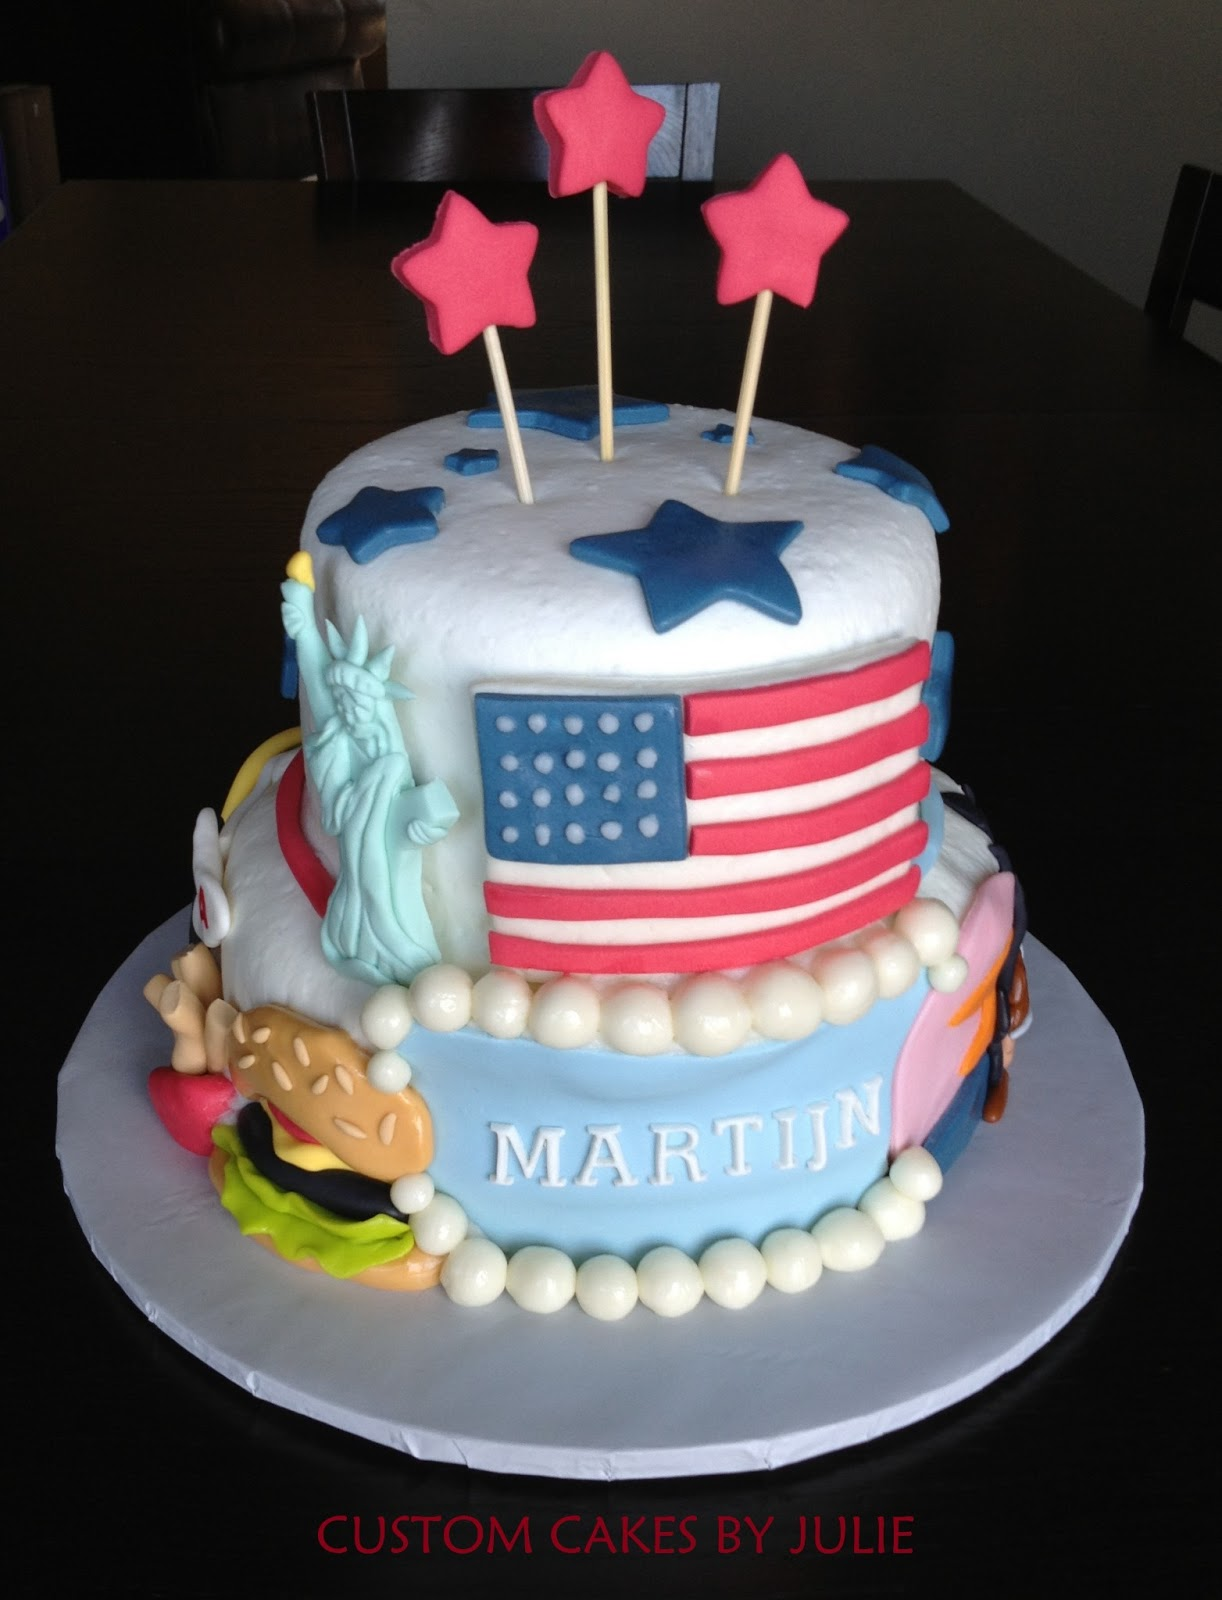 Native American Themed Cake